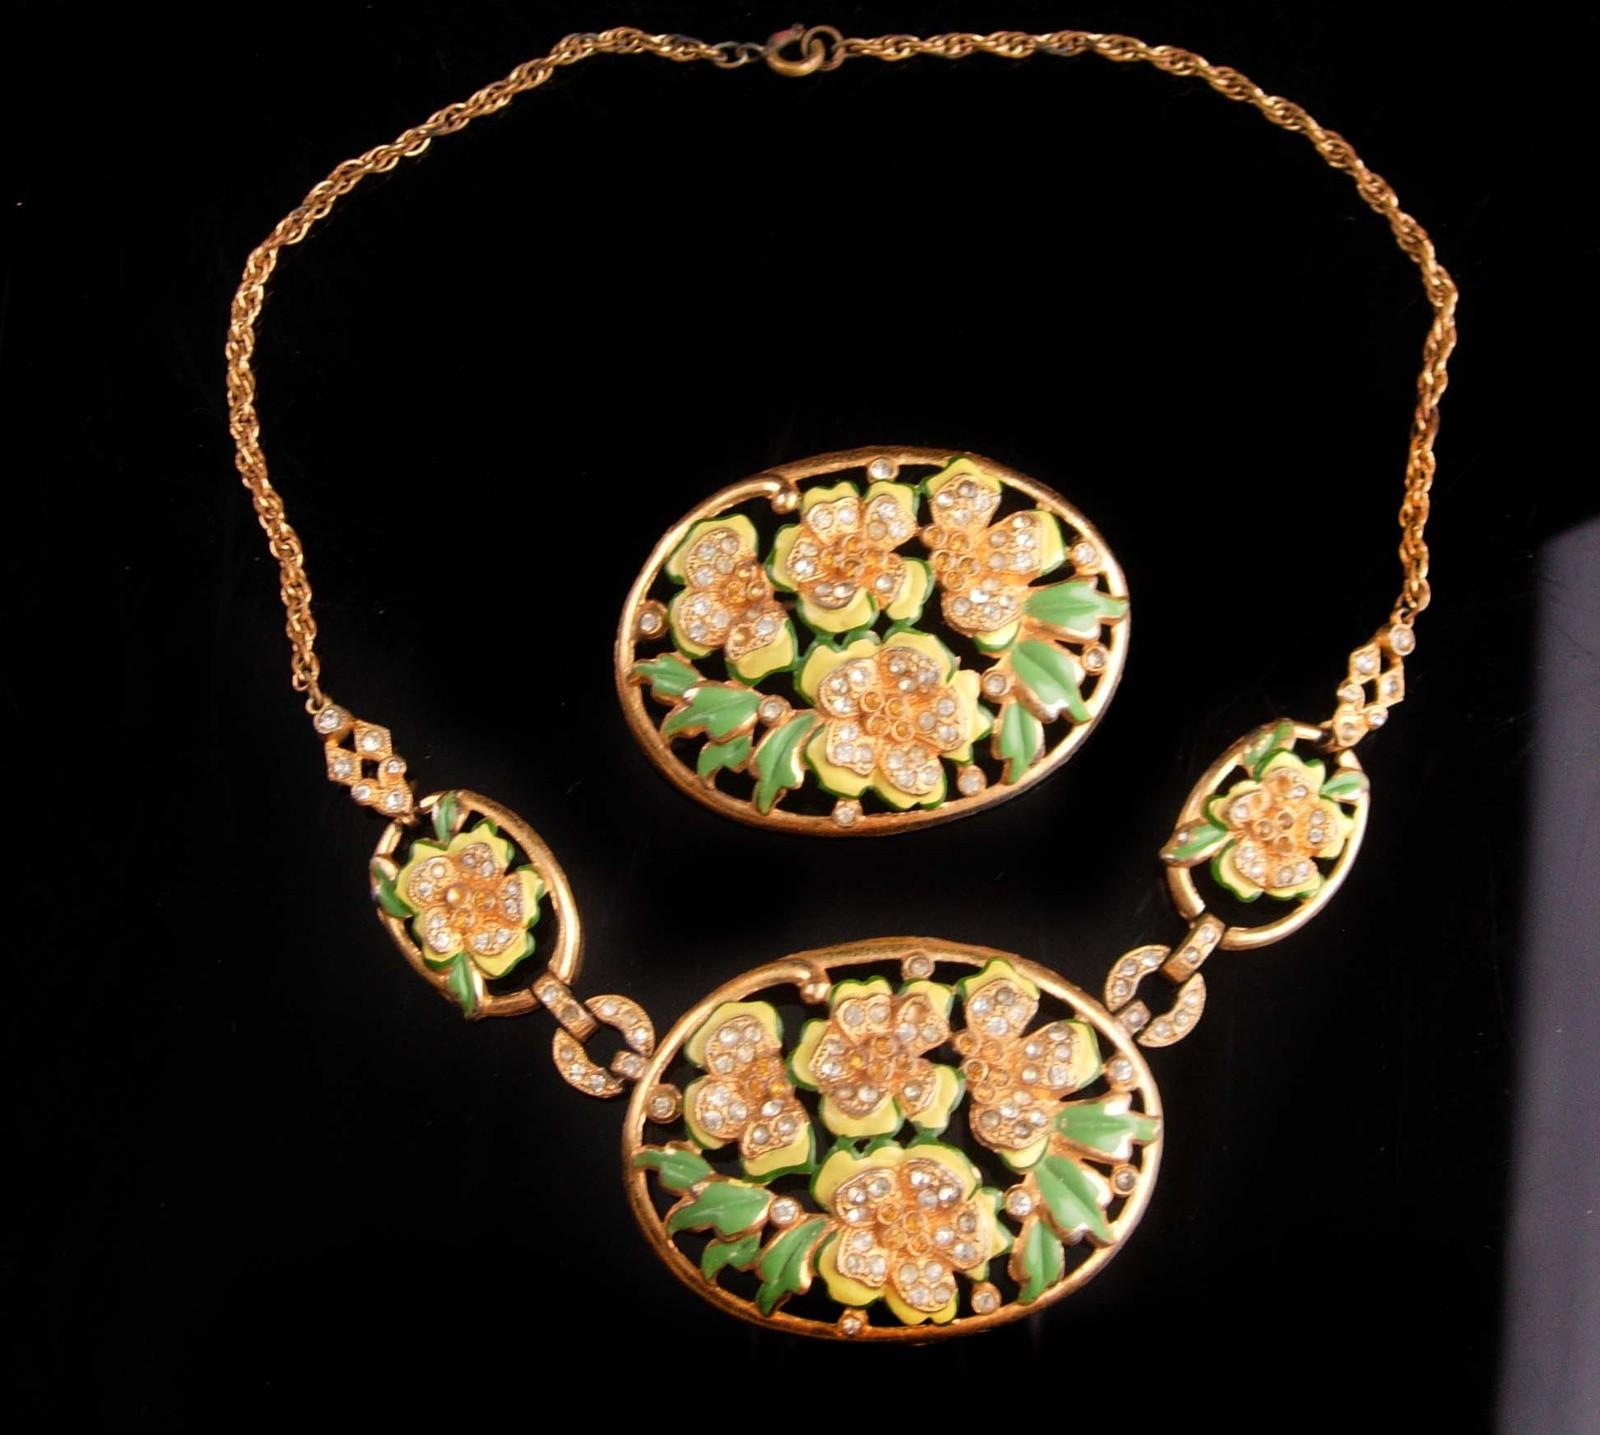 Vintage enamel necklace set - flower brooch - demi Parure - hand painted - rhine